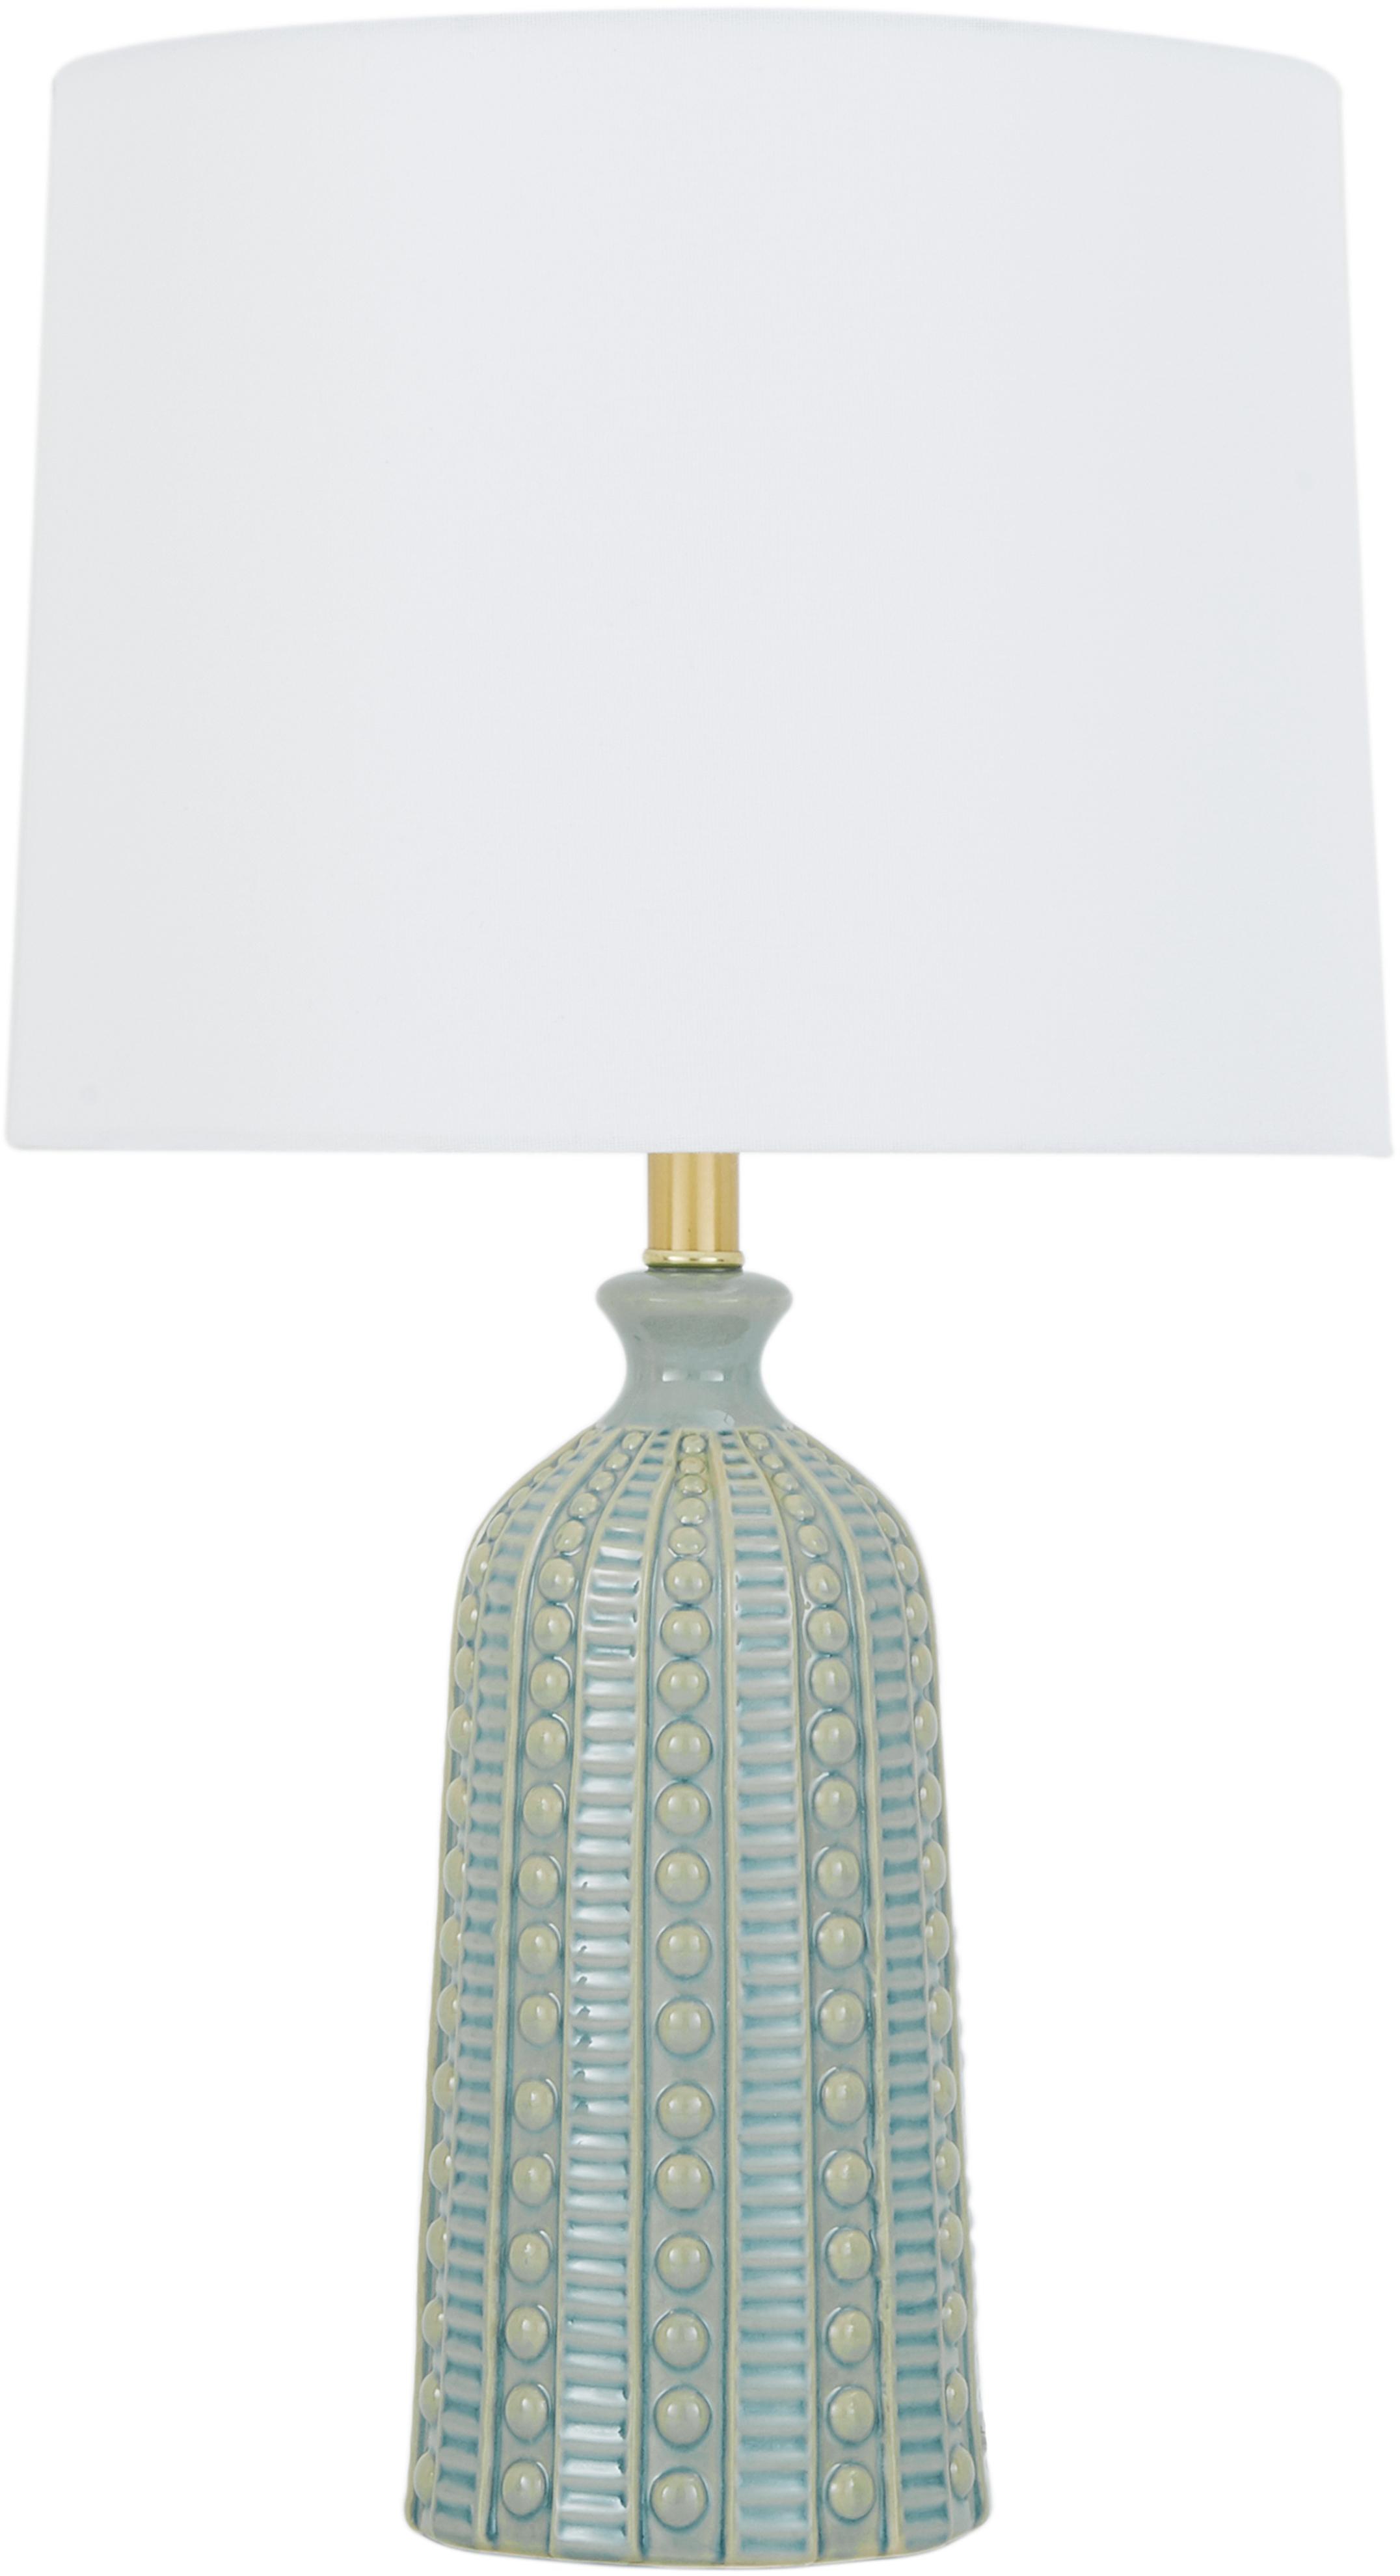 Tafellamp Nizza, Lampenkap: textiel, Lampvoet: keramiek, vermessingd met, Saliegroen, Ø 35 x H 60 cm